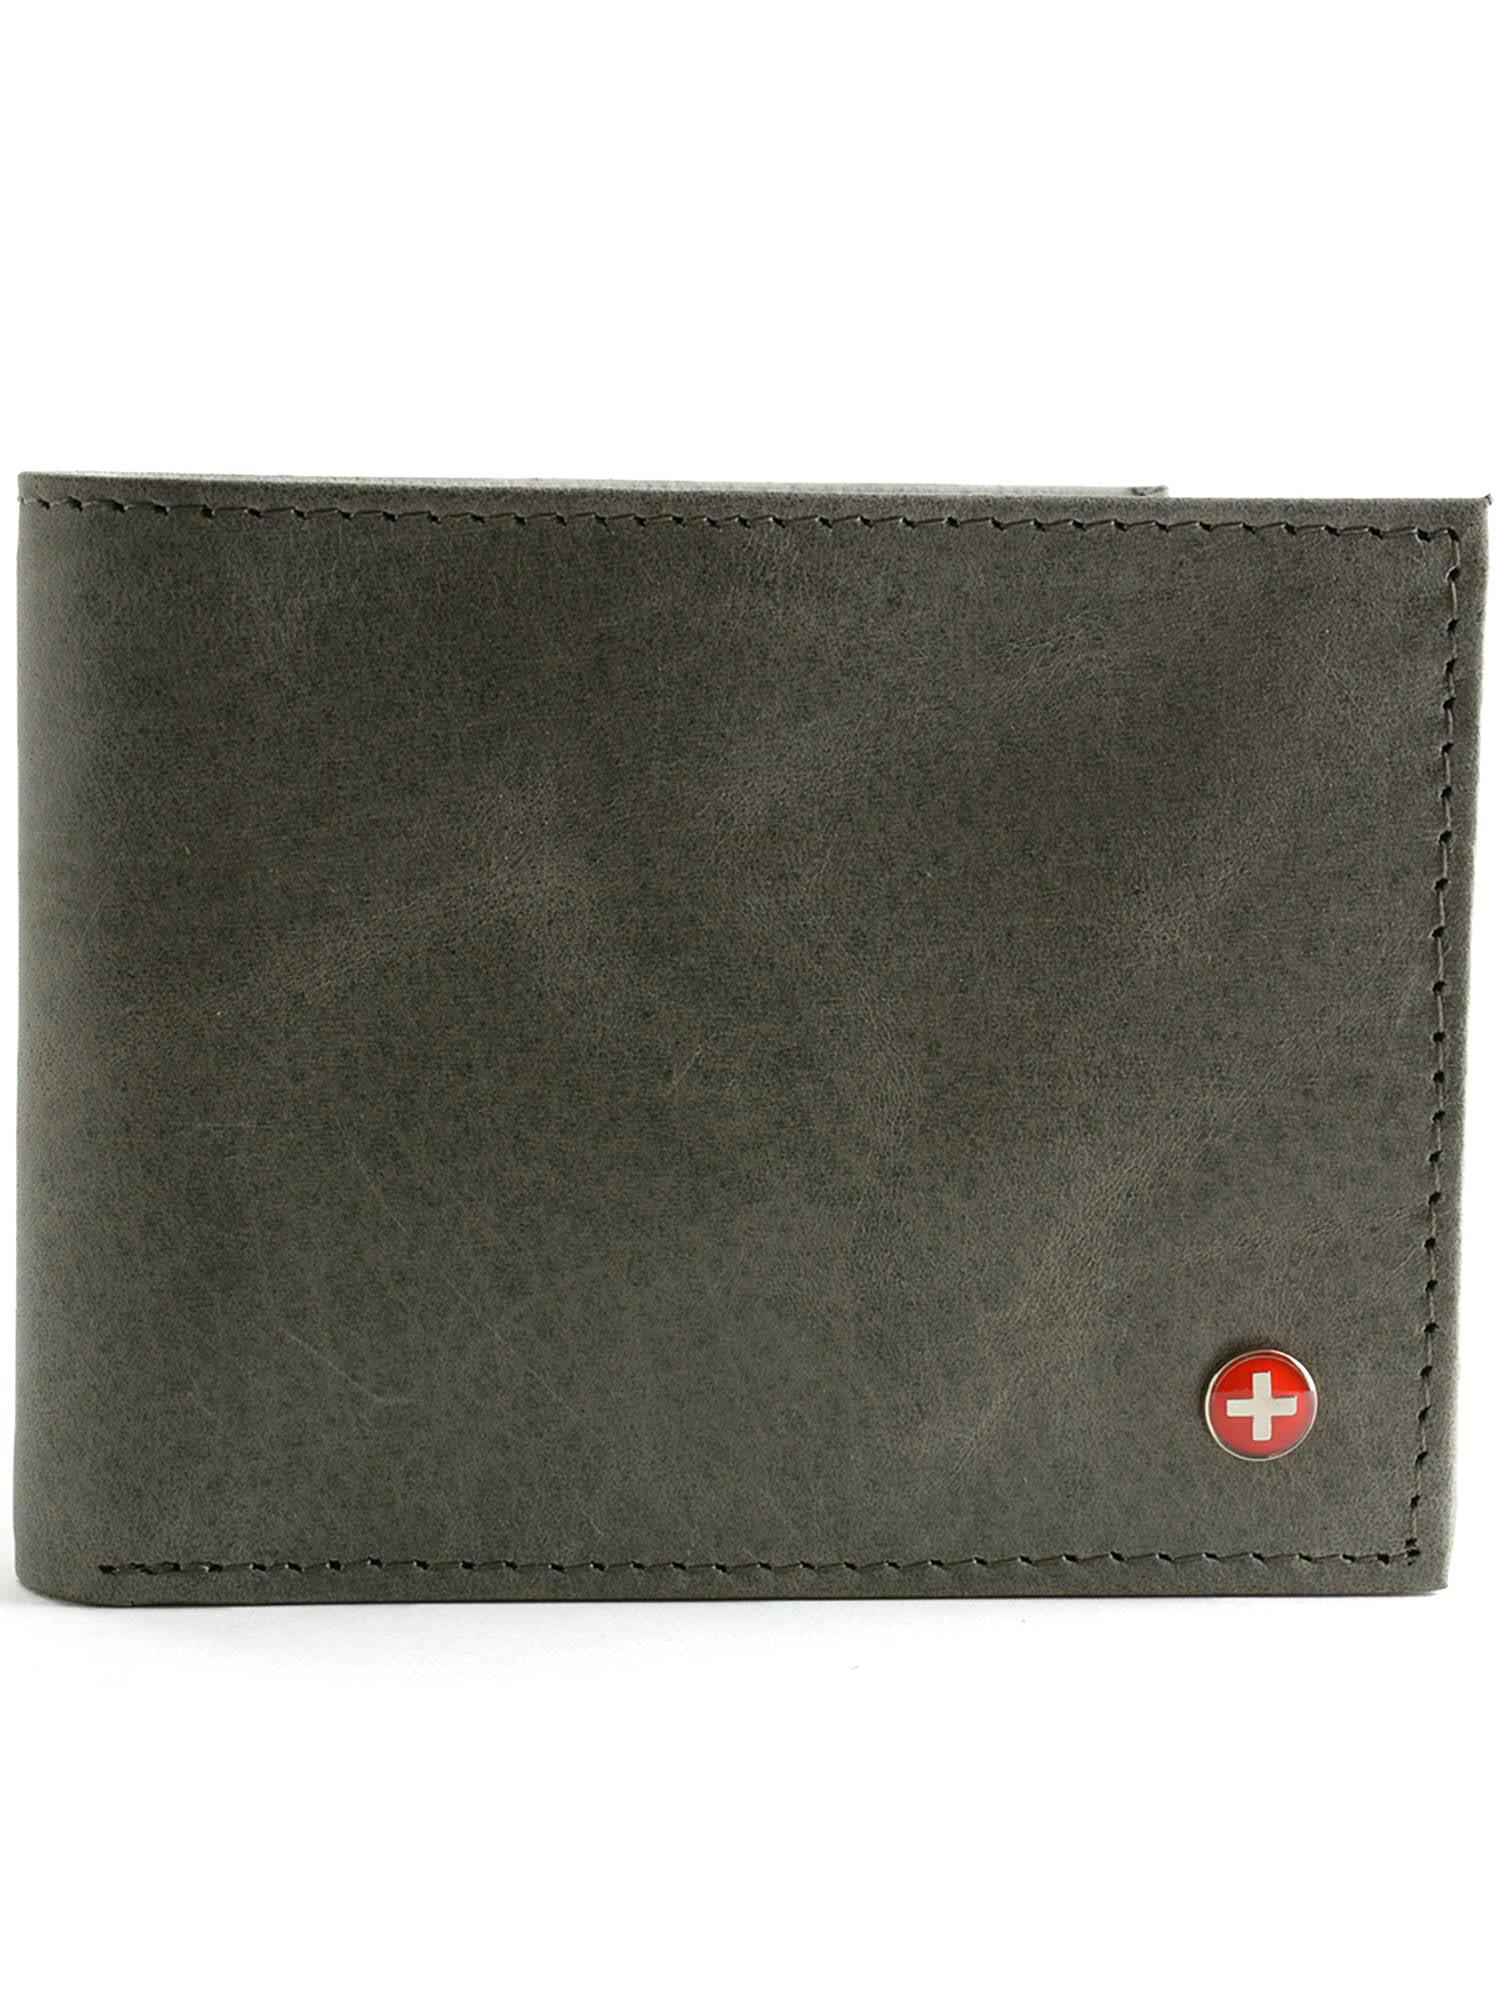 RFID Blocking Mens Bifold Wallet Keep Identity /& Credit Cards Safe